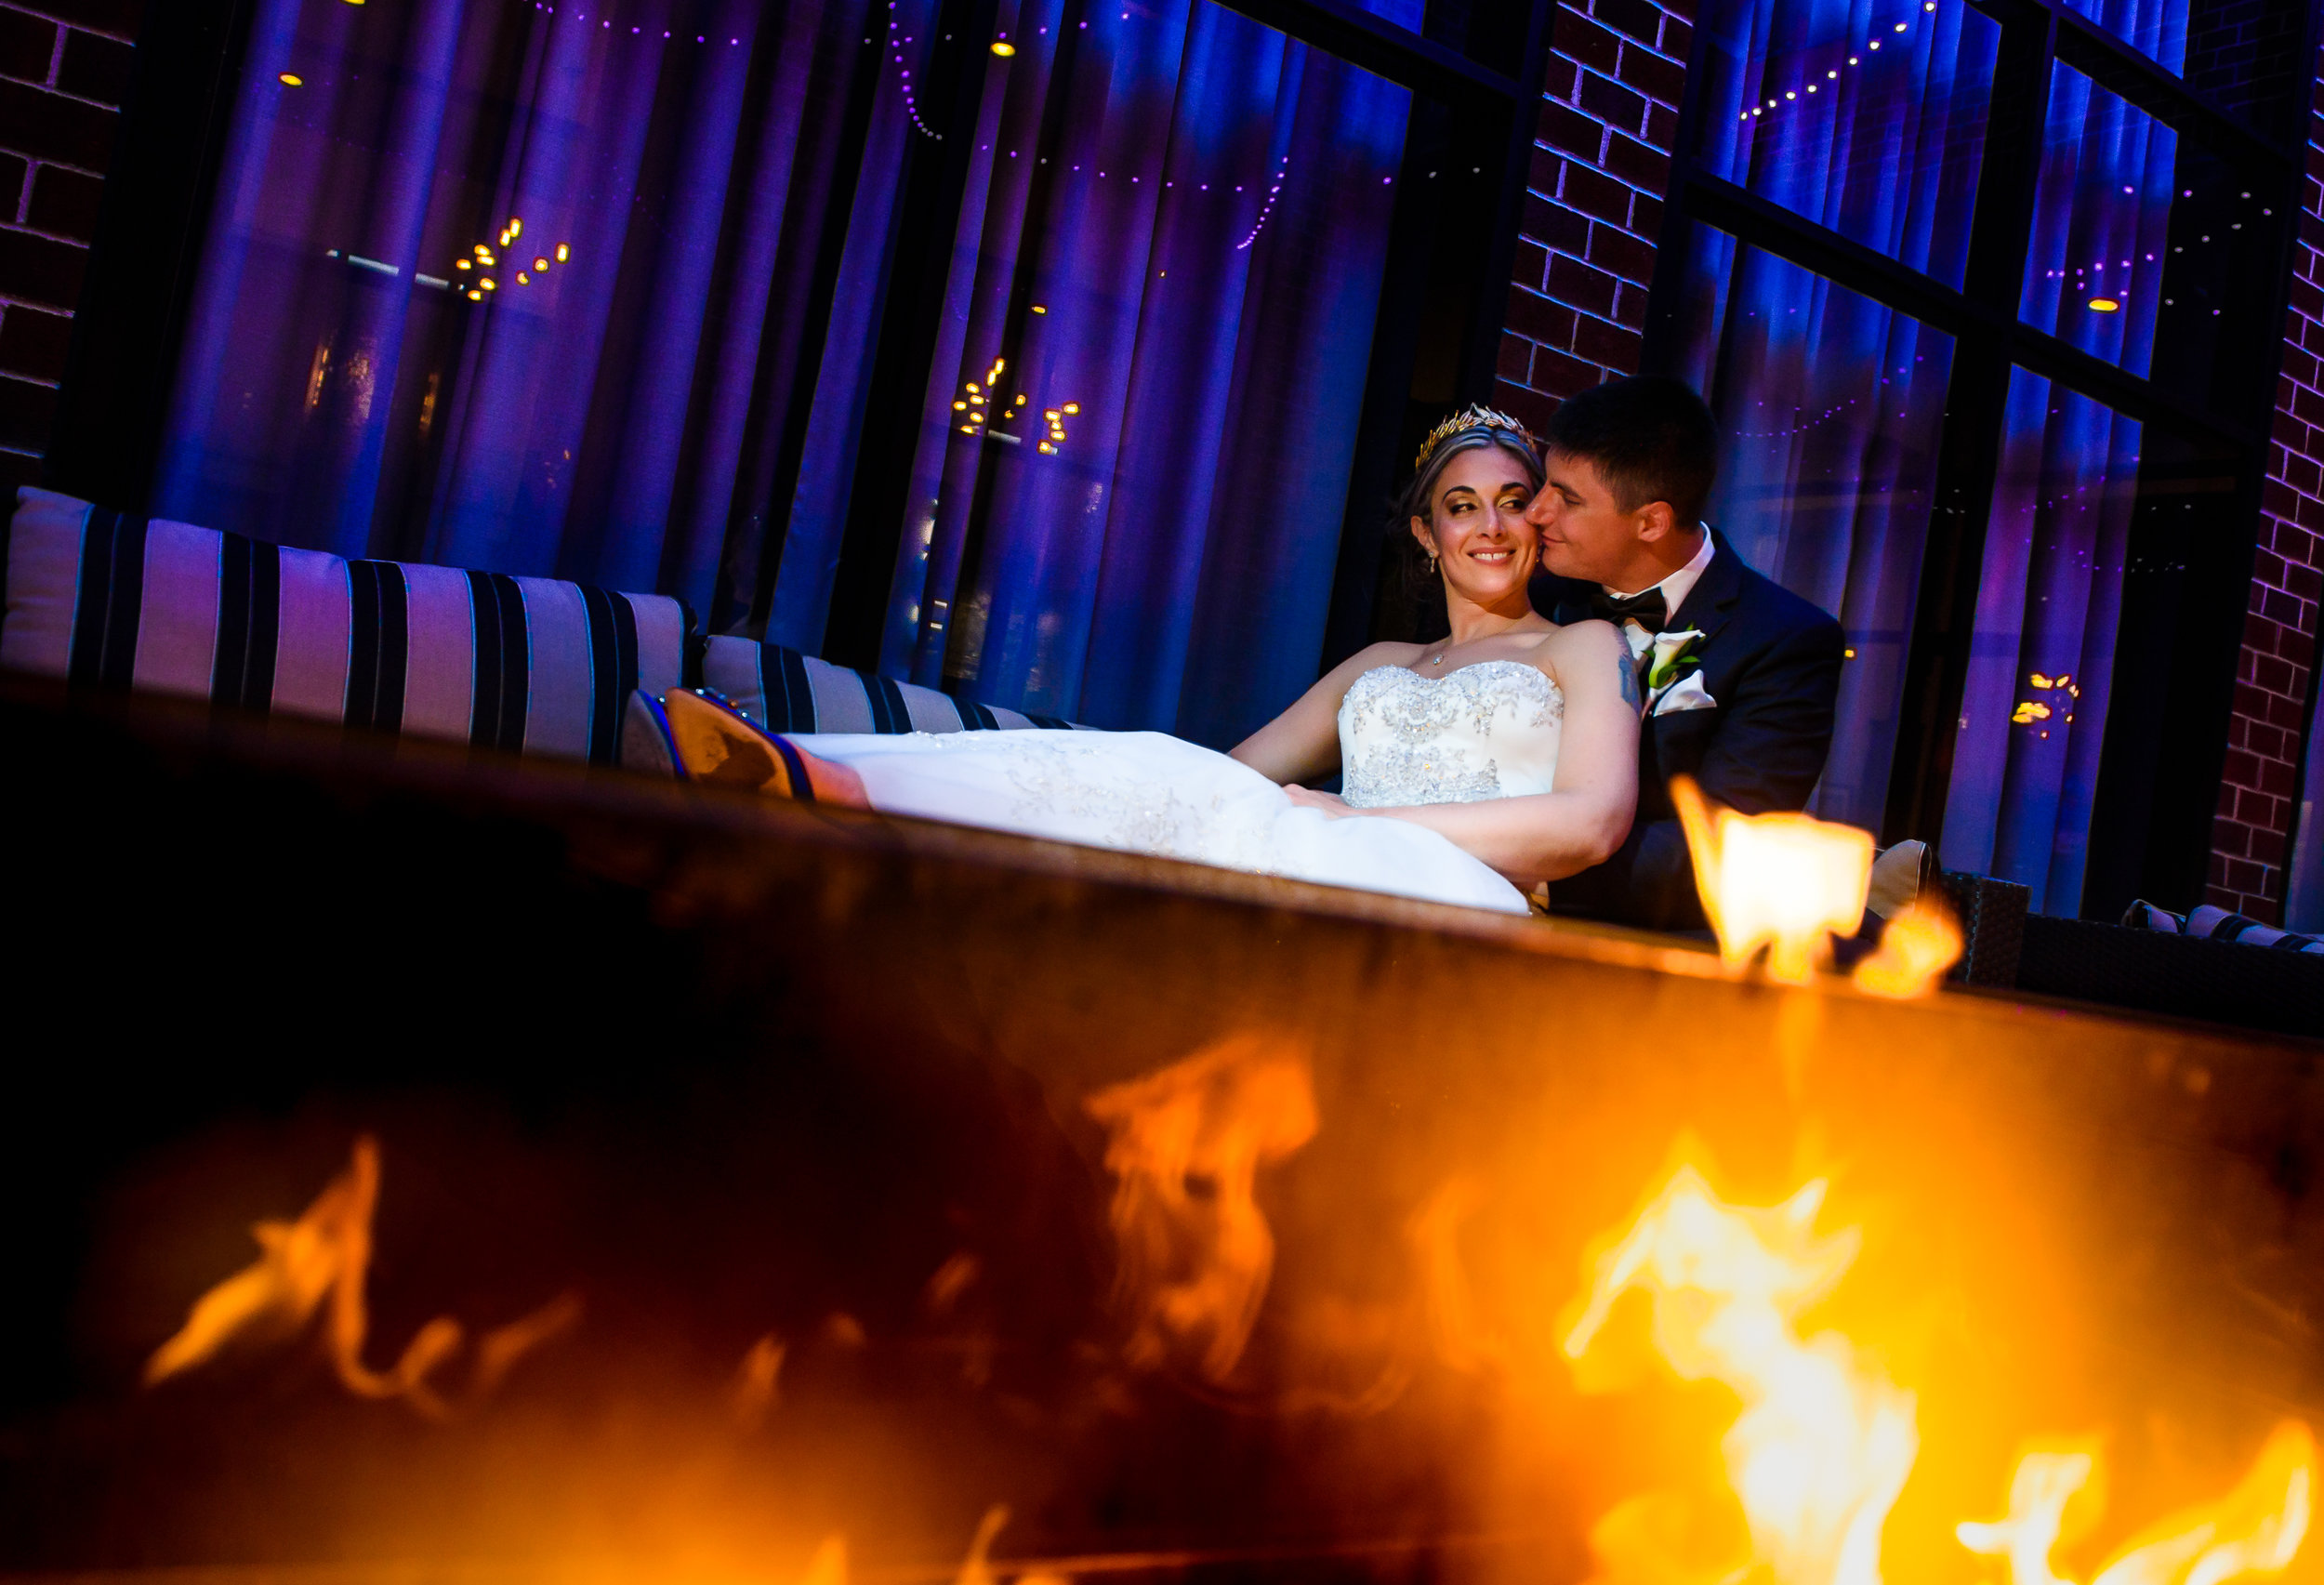 mystic-artistic-connecticut-wedding-photographers-chris-nachtwey-2017-1.jpg